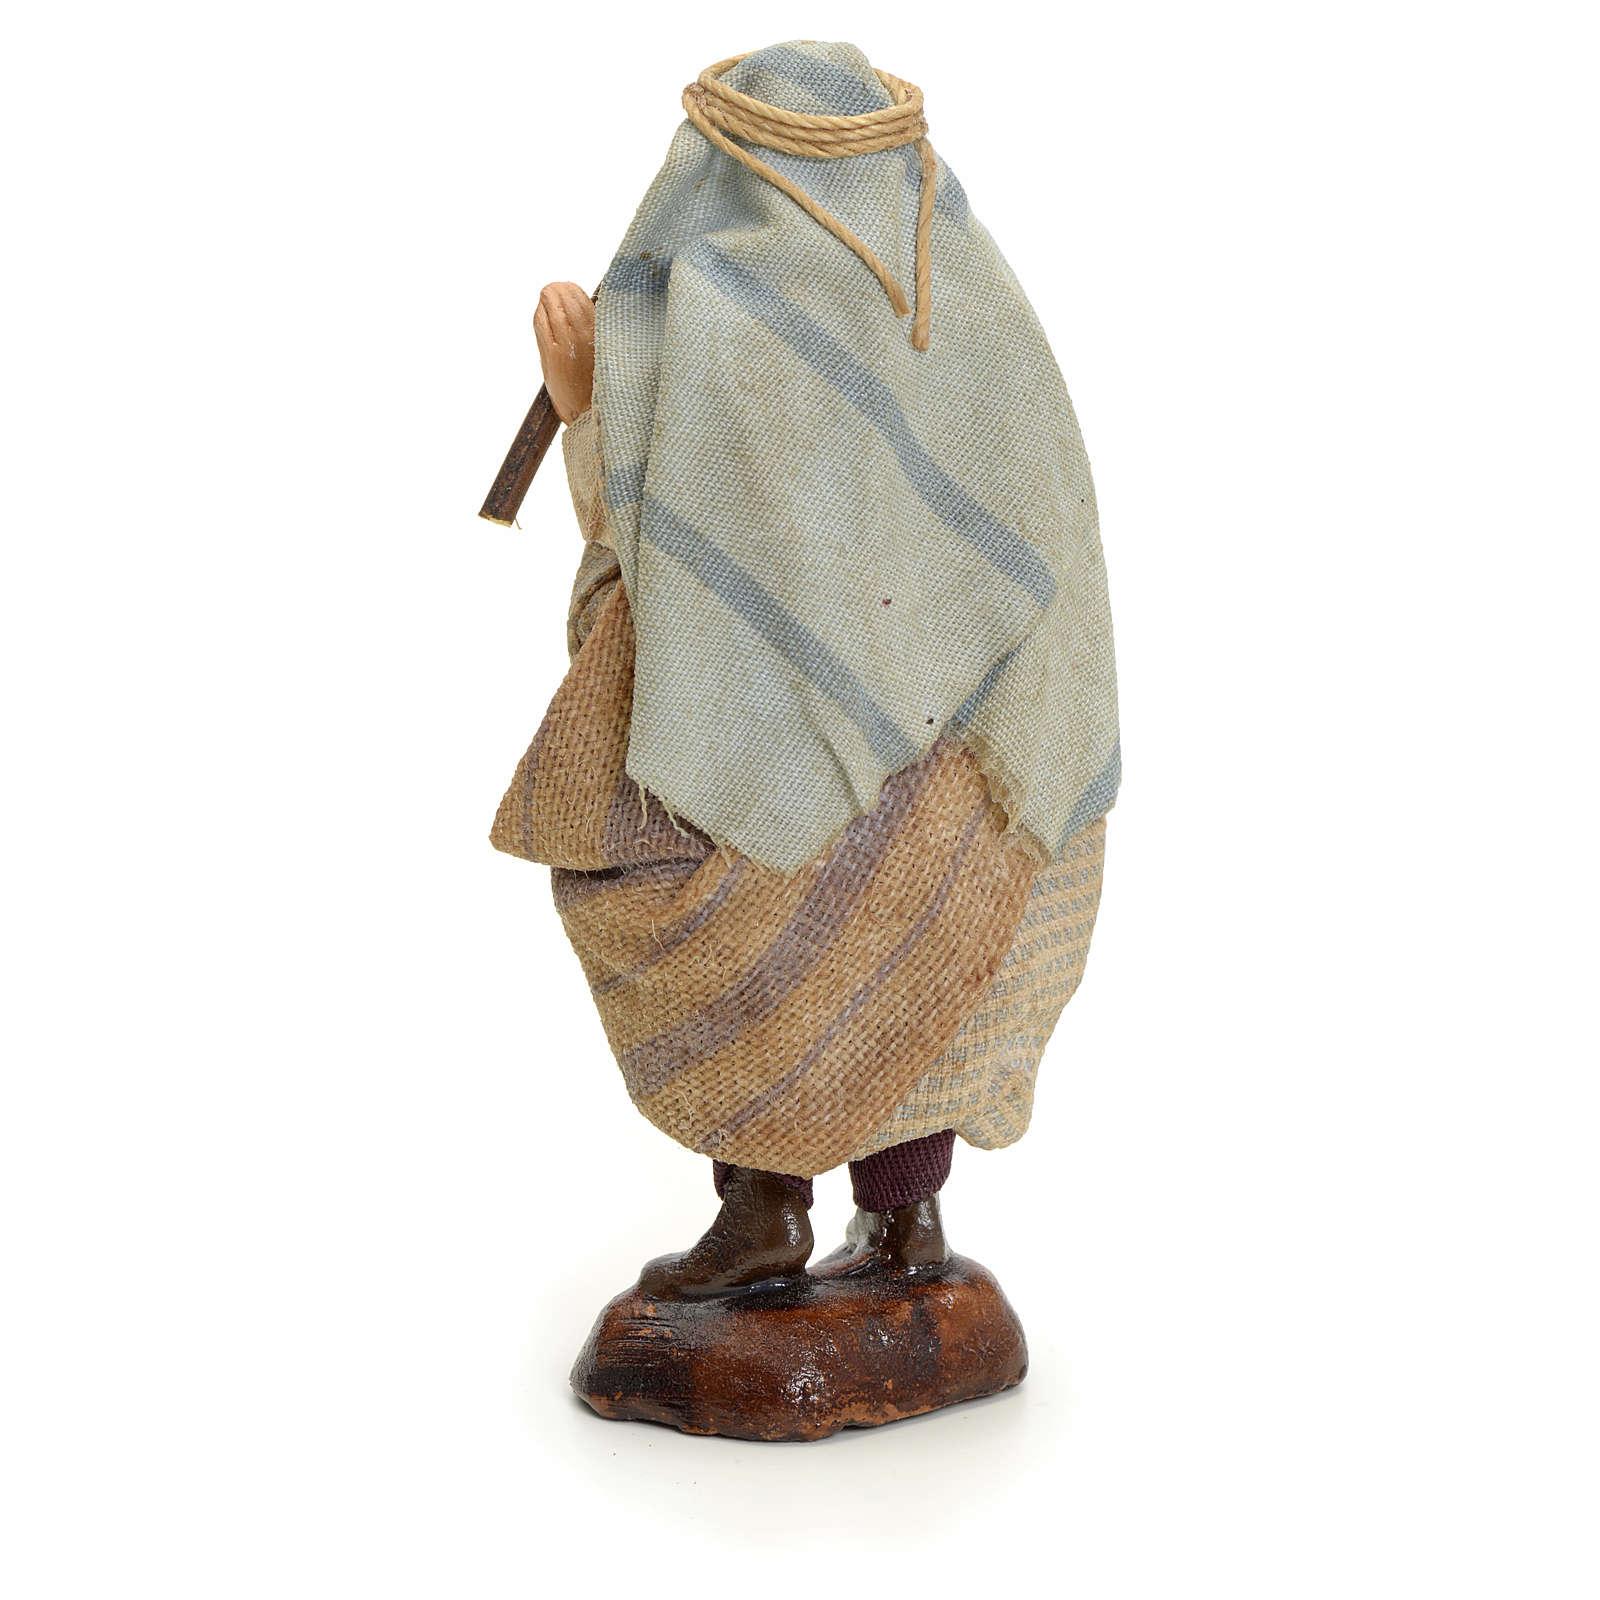 Neapolitan Nativity figurine, Arabian piper, 8 cm 4